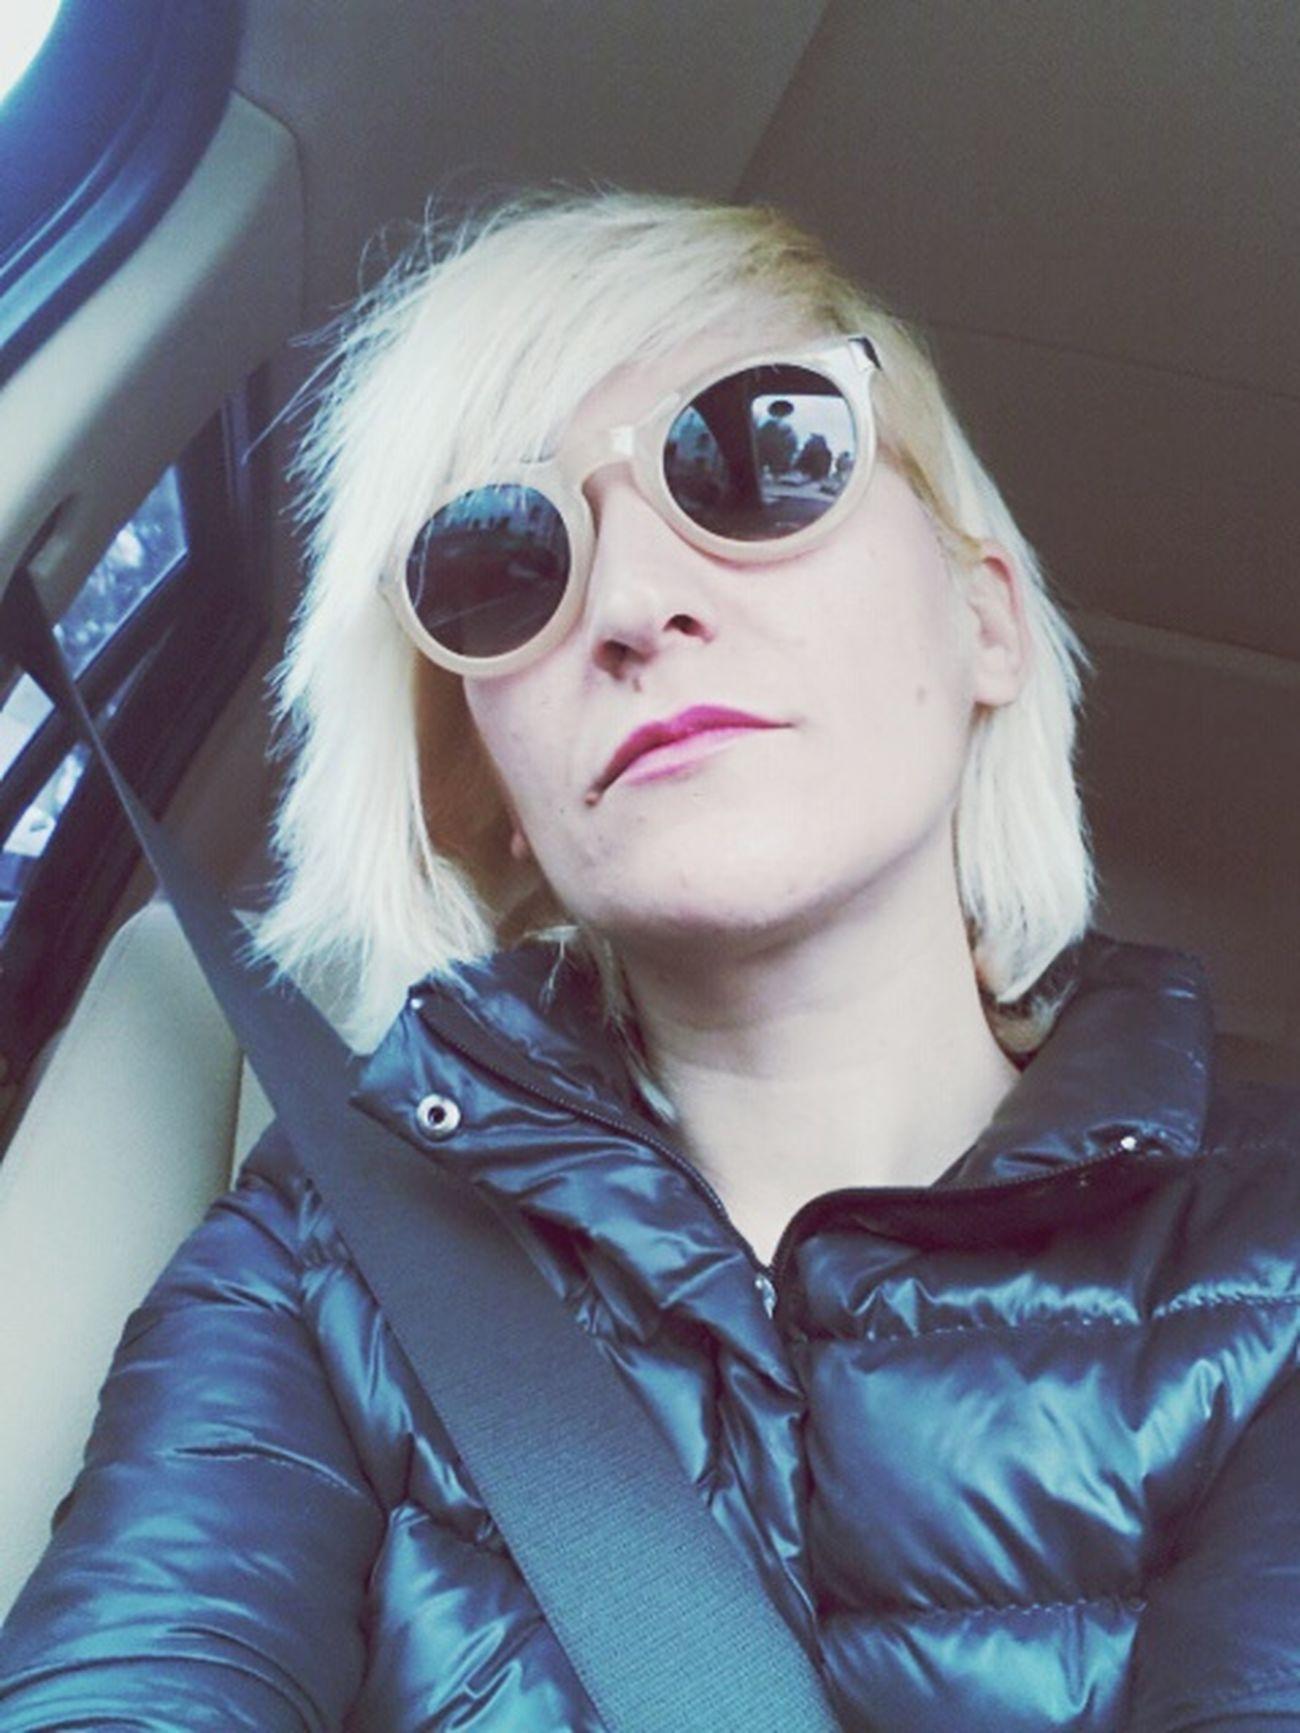 Sunglasses ✌👌 Sunglasses Self Portrait Siluet Enjoying Life That's Me